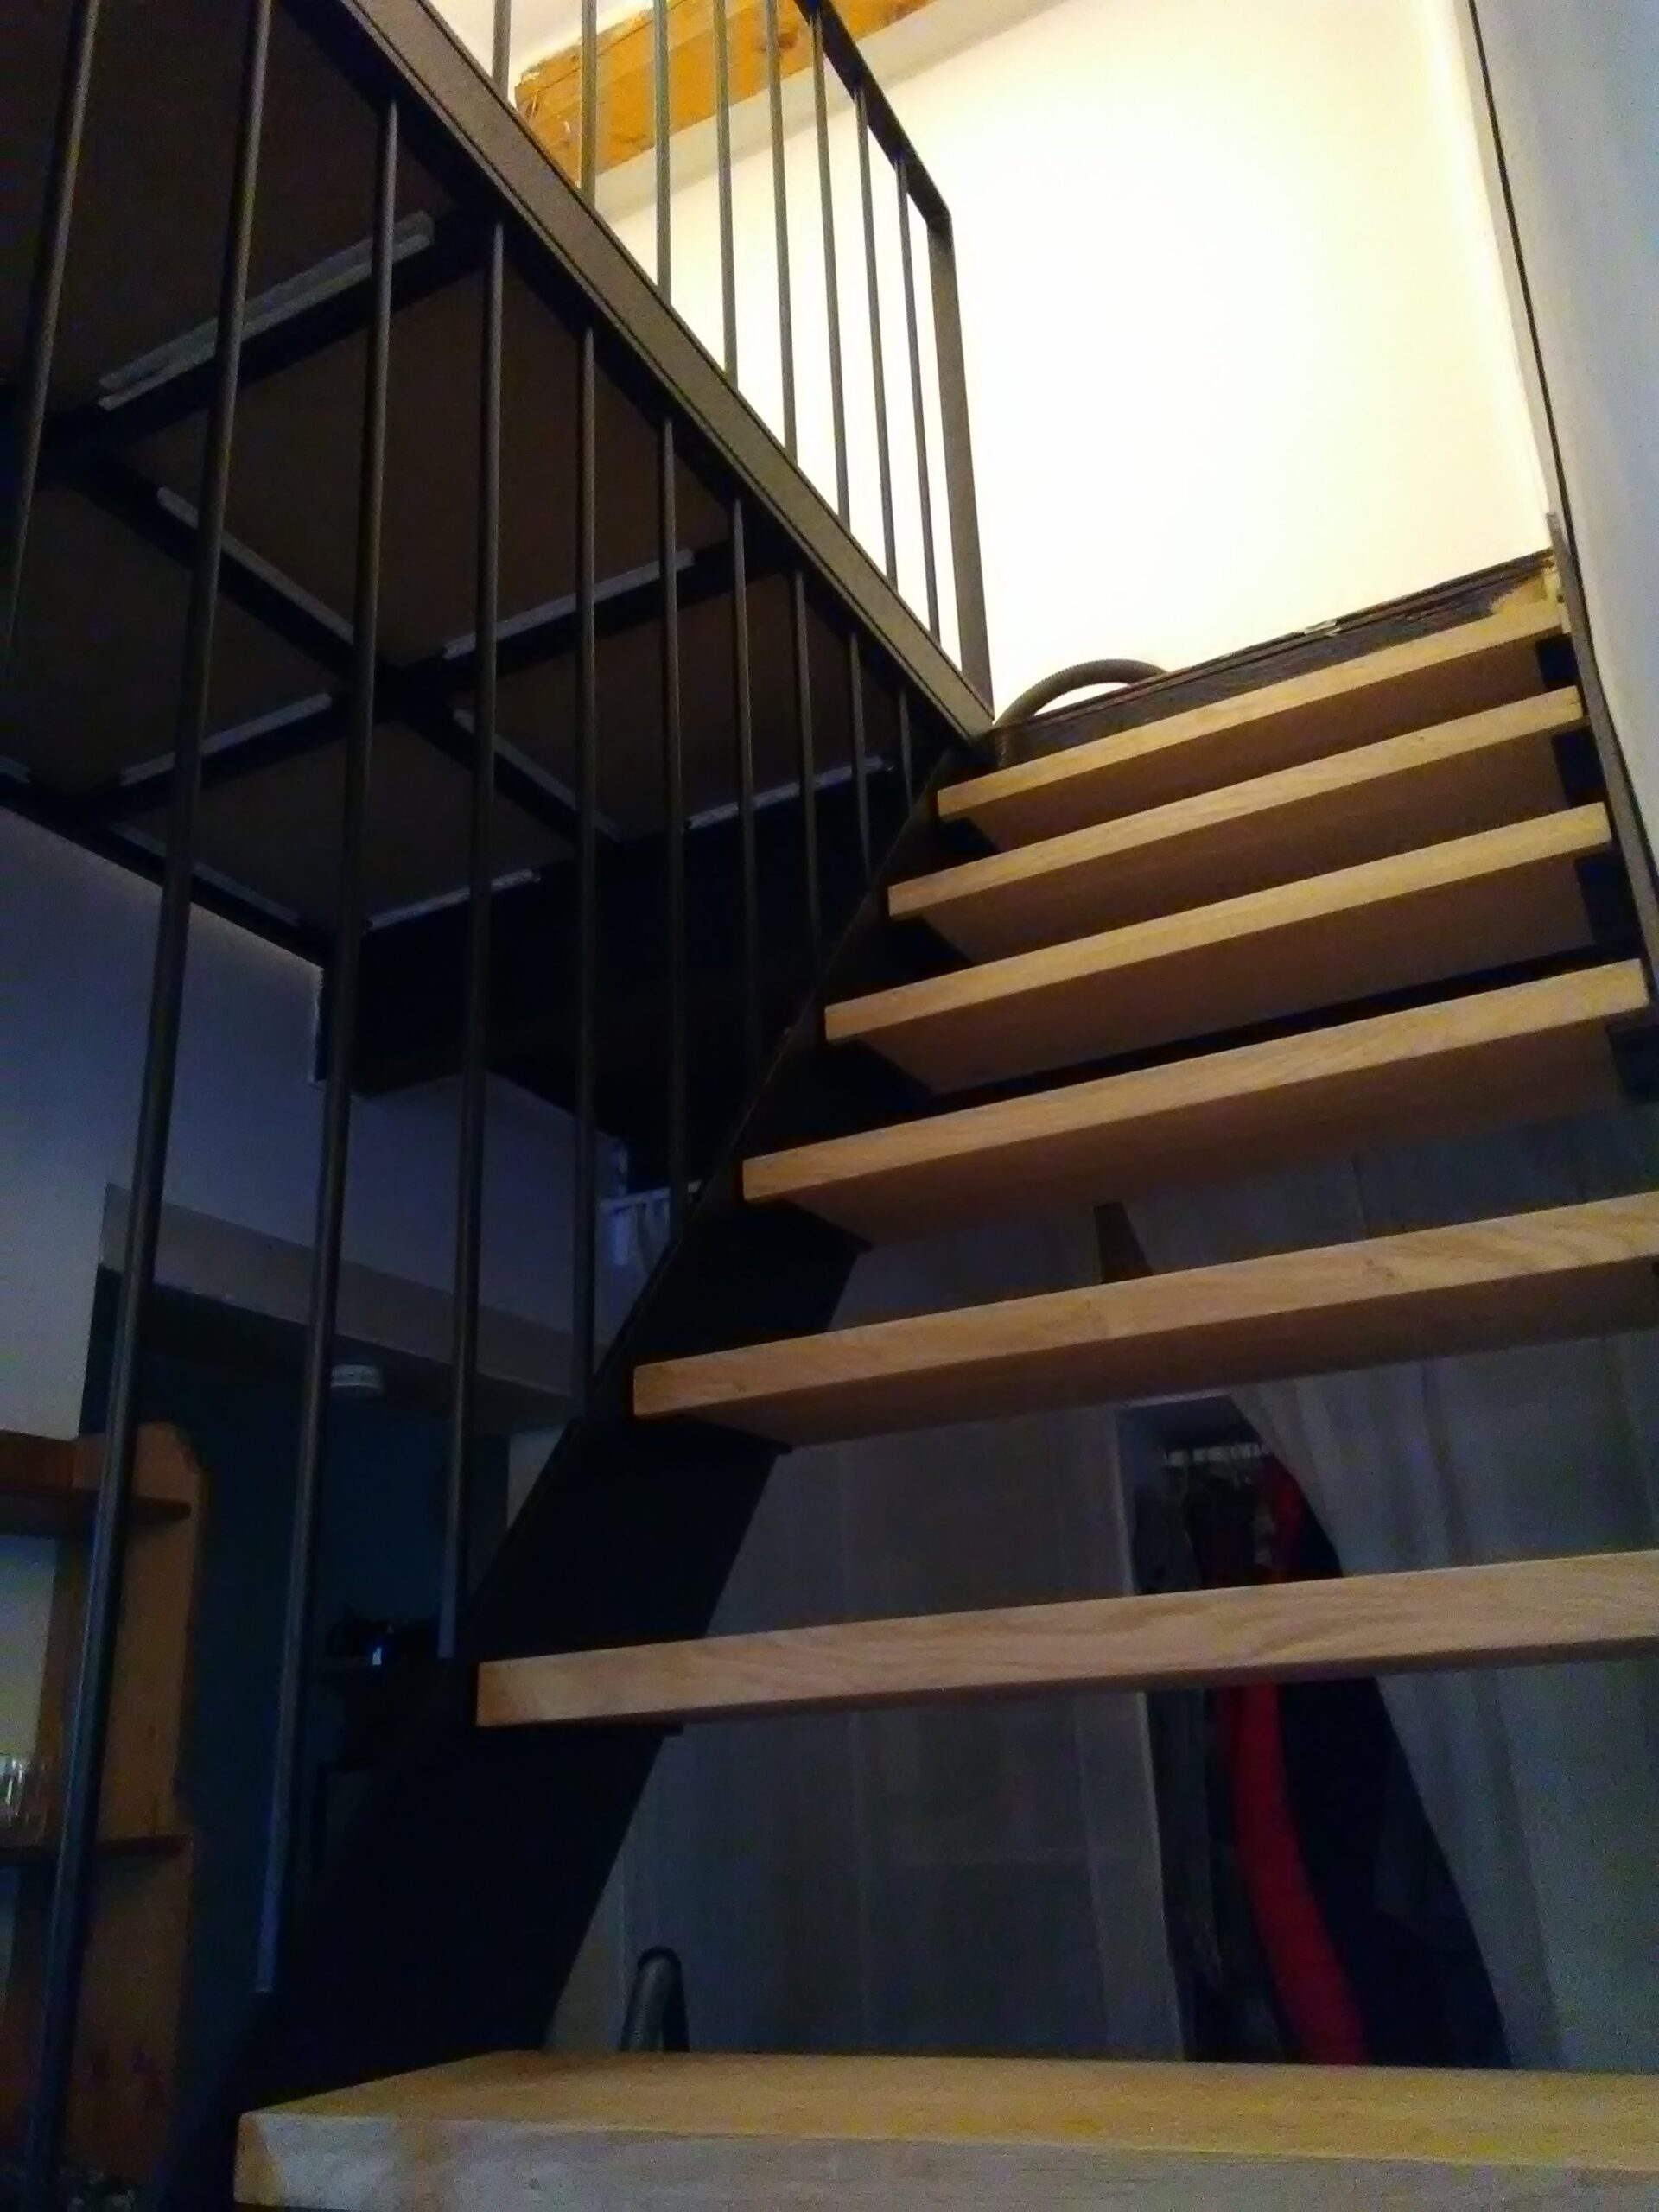 https://www.mon-artisan-ferronnier.com/wp-content/uploads/2021/04/escalier18-scaled.jpeg